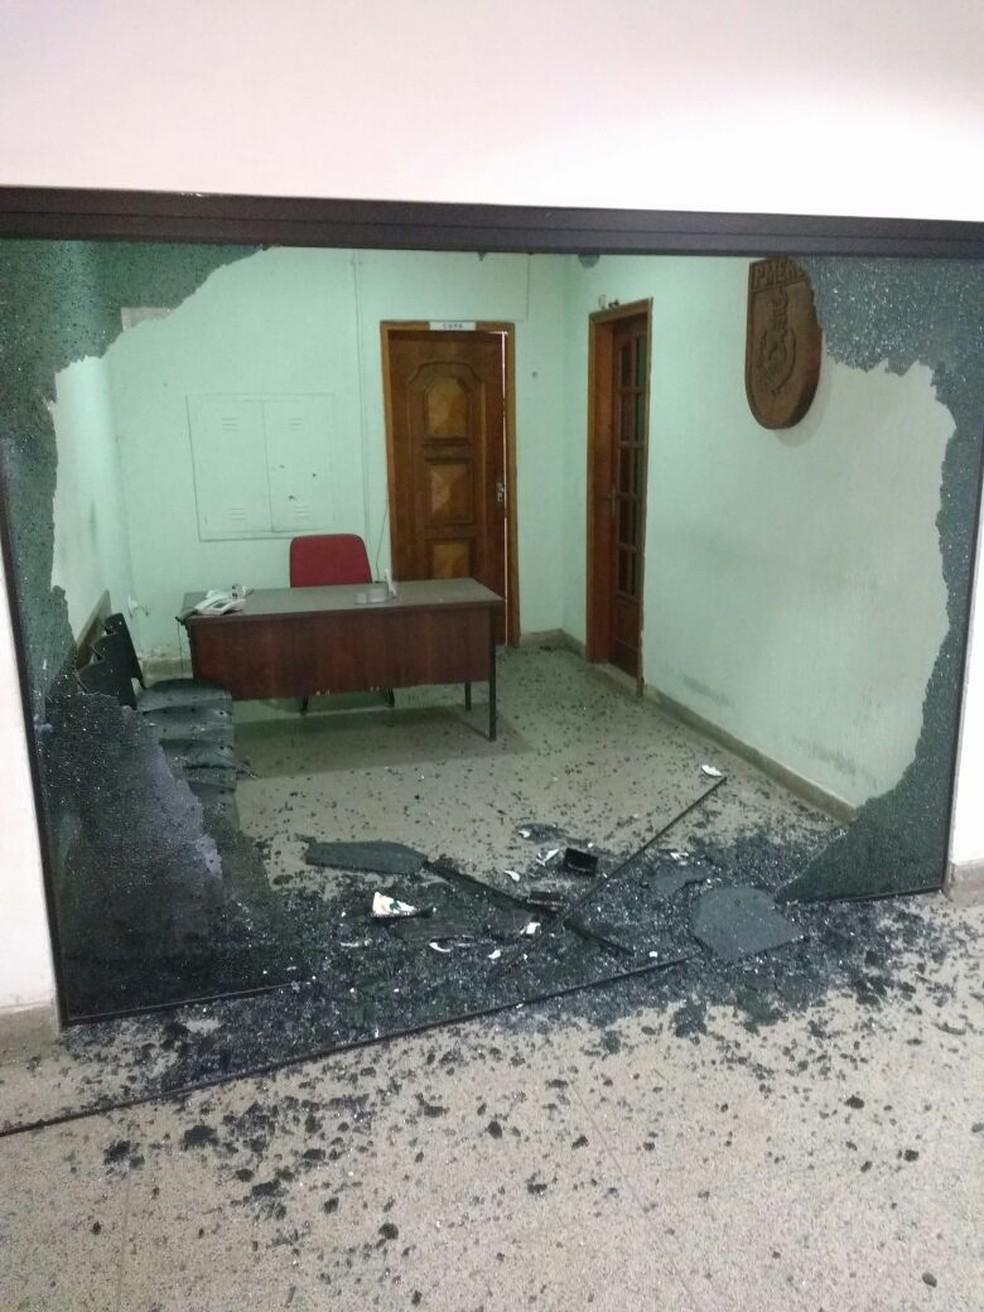 Disparo atingiu porta de vidro da sala do comandante (Foto: Enviado por WhatsApp)